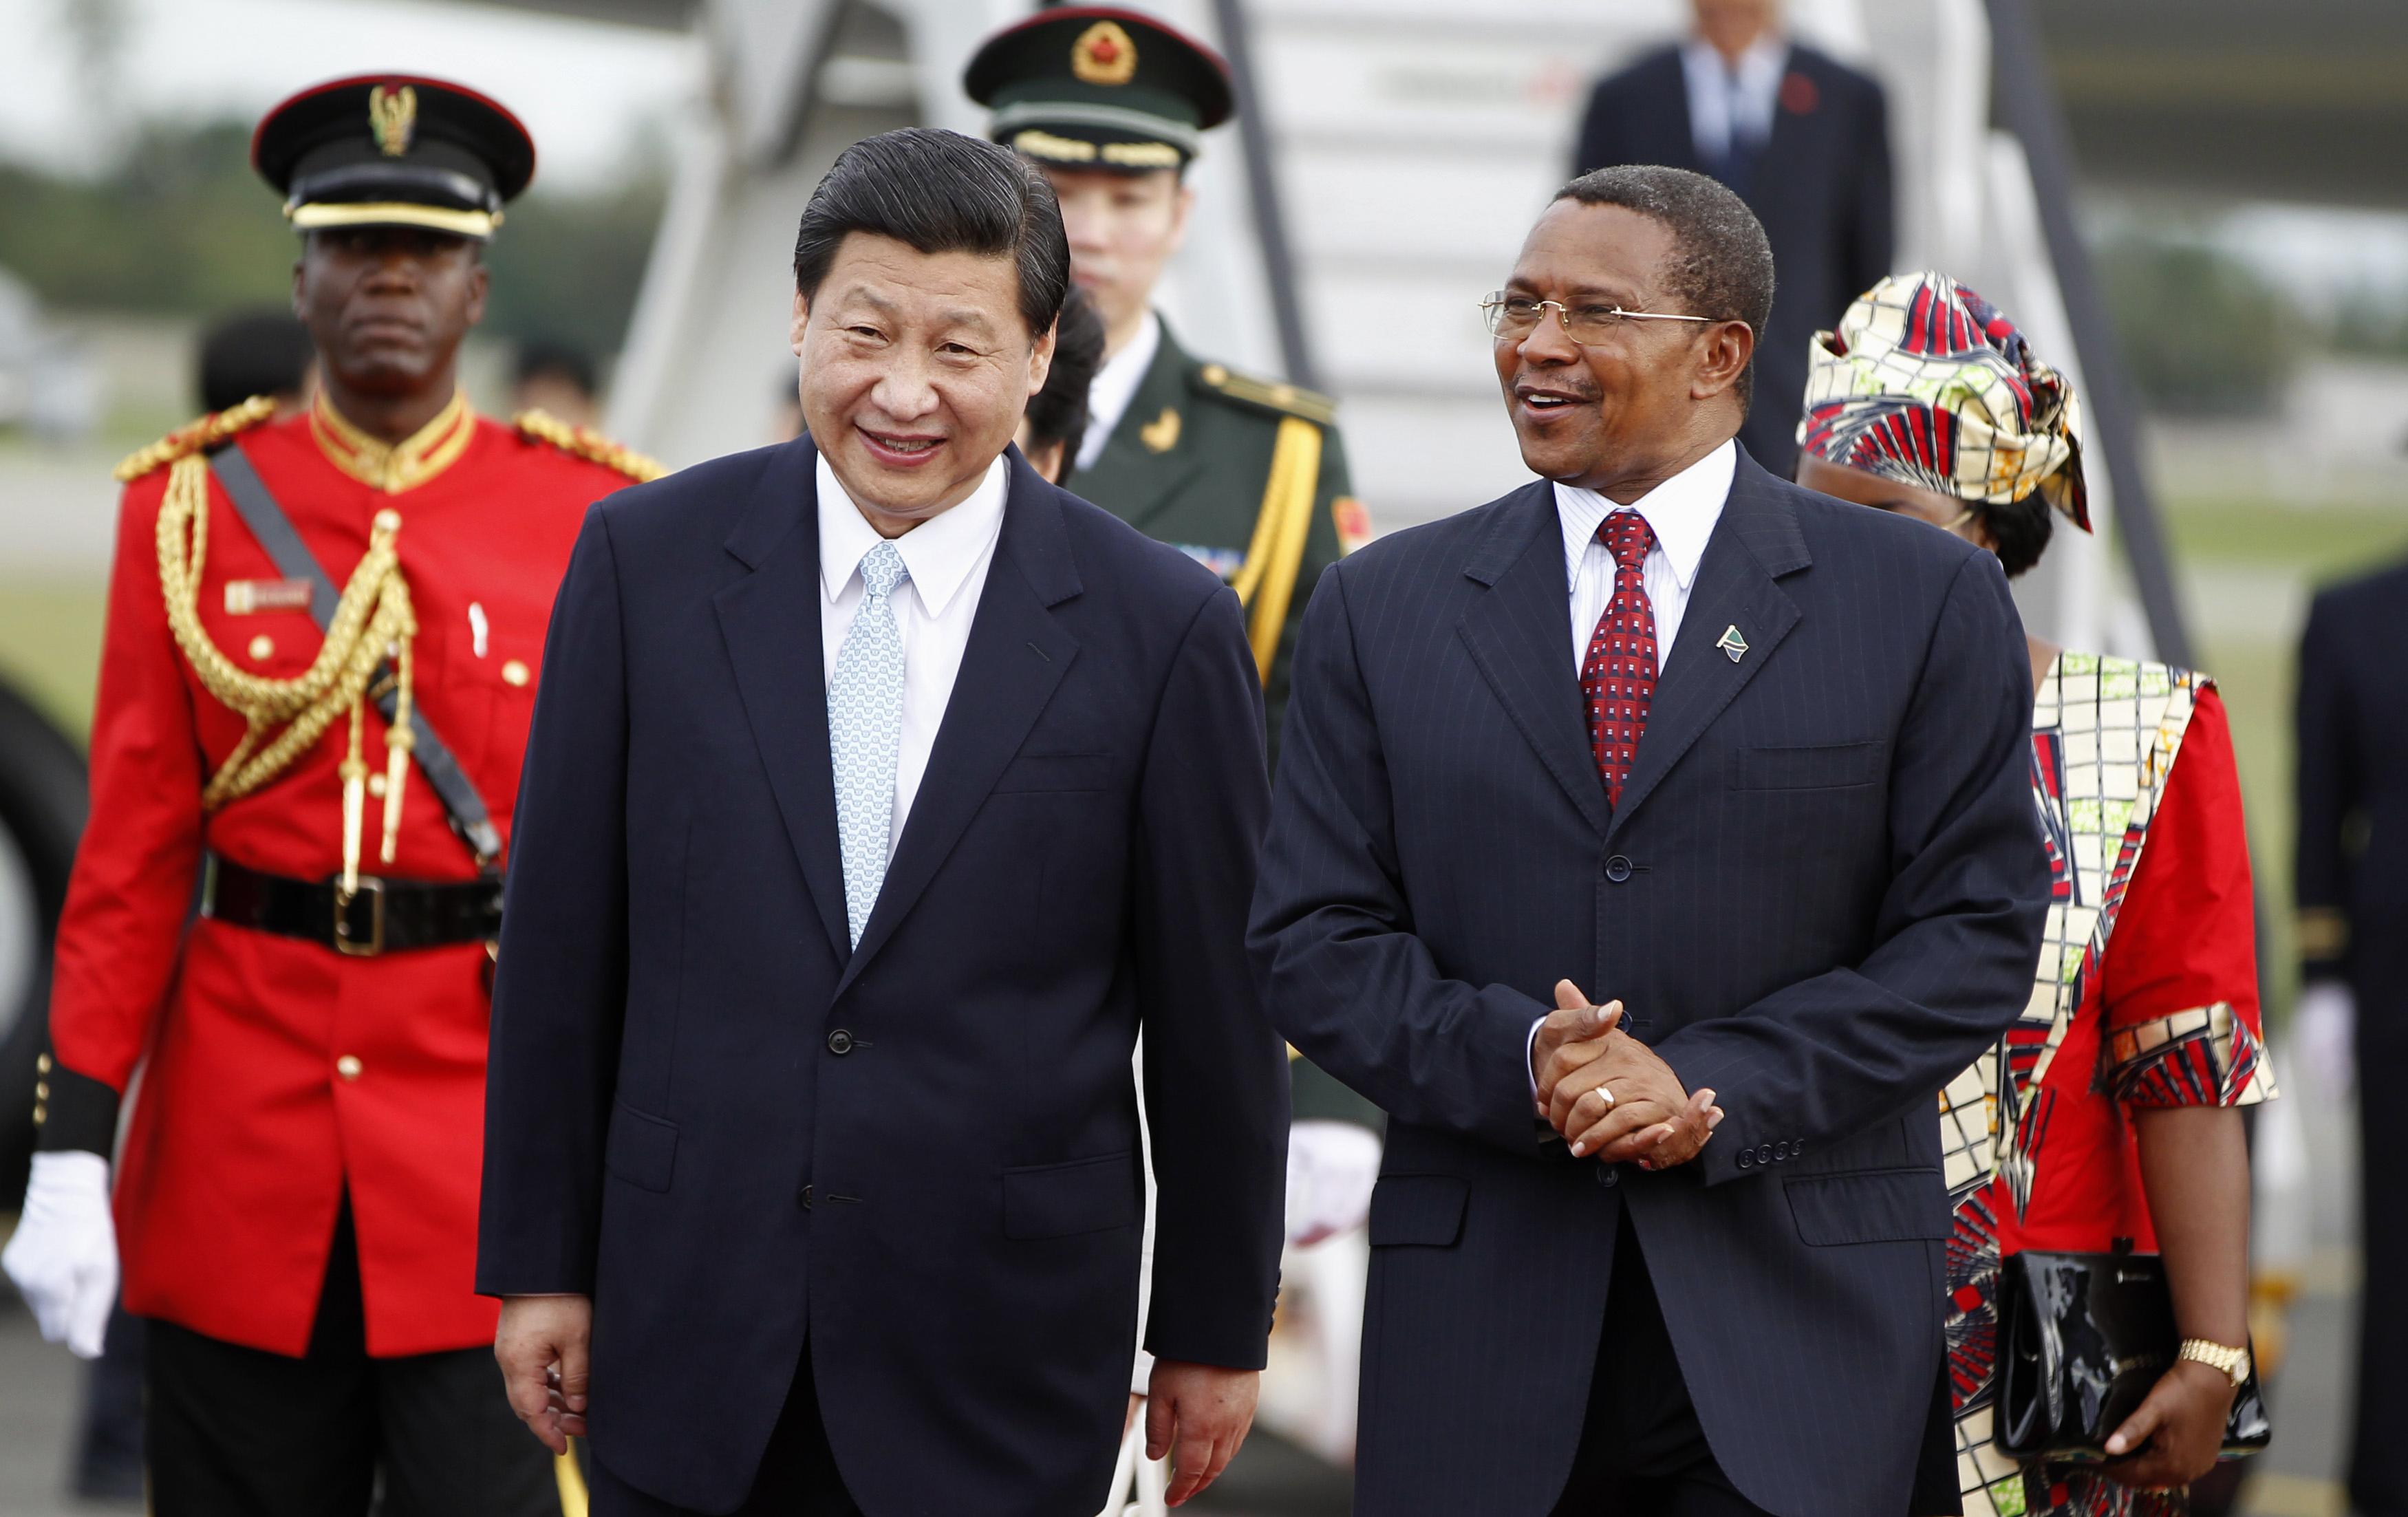 dissertation china in africa China's impact on africa – the role of trade and fdi matthias busse ceren erdogan henning mühlen ruhr-university bochum ruhr-university bochum university of.